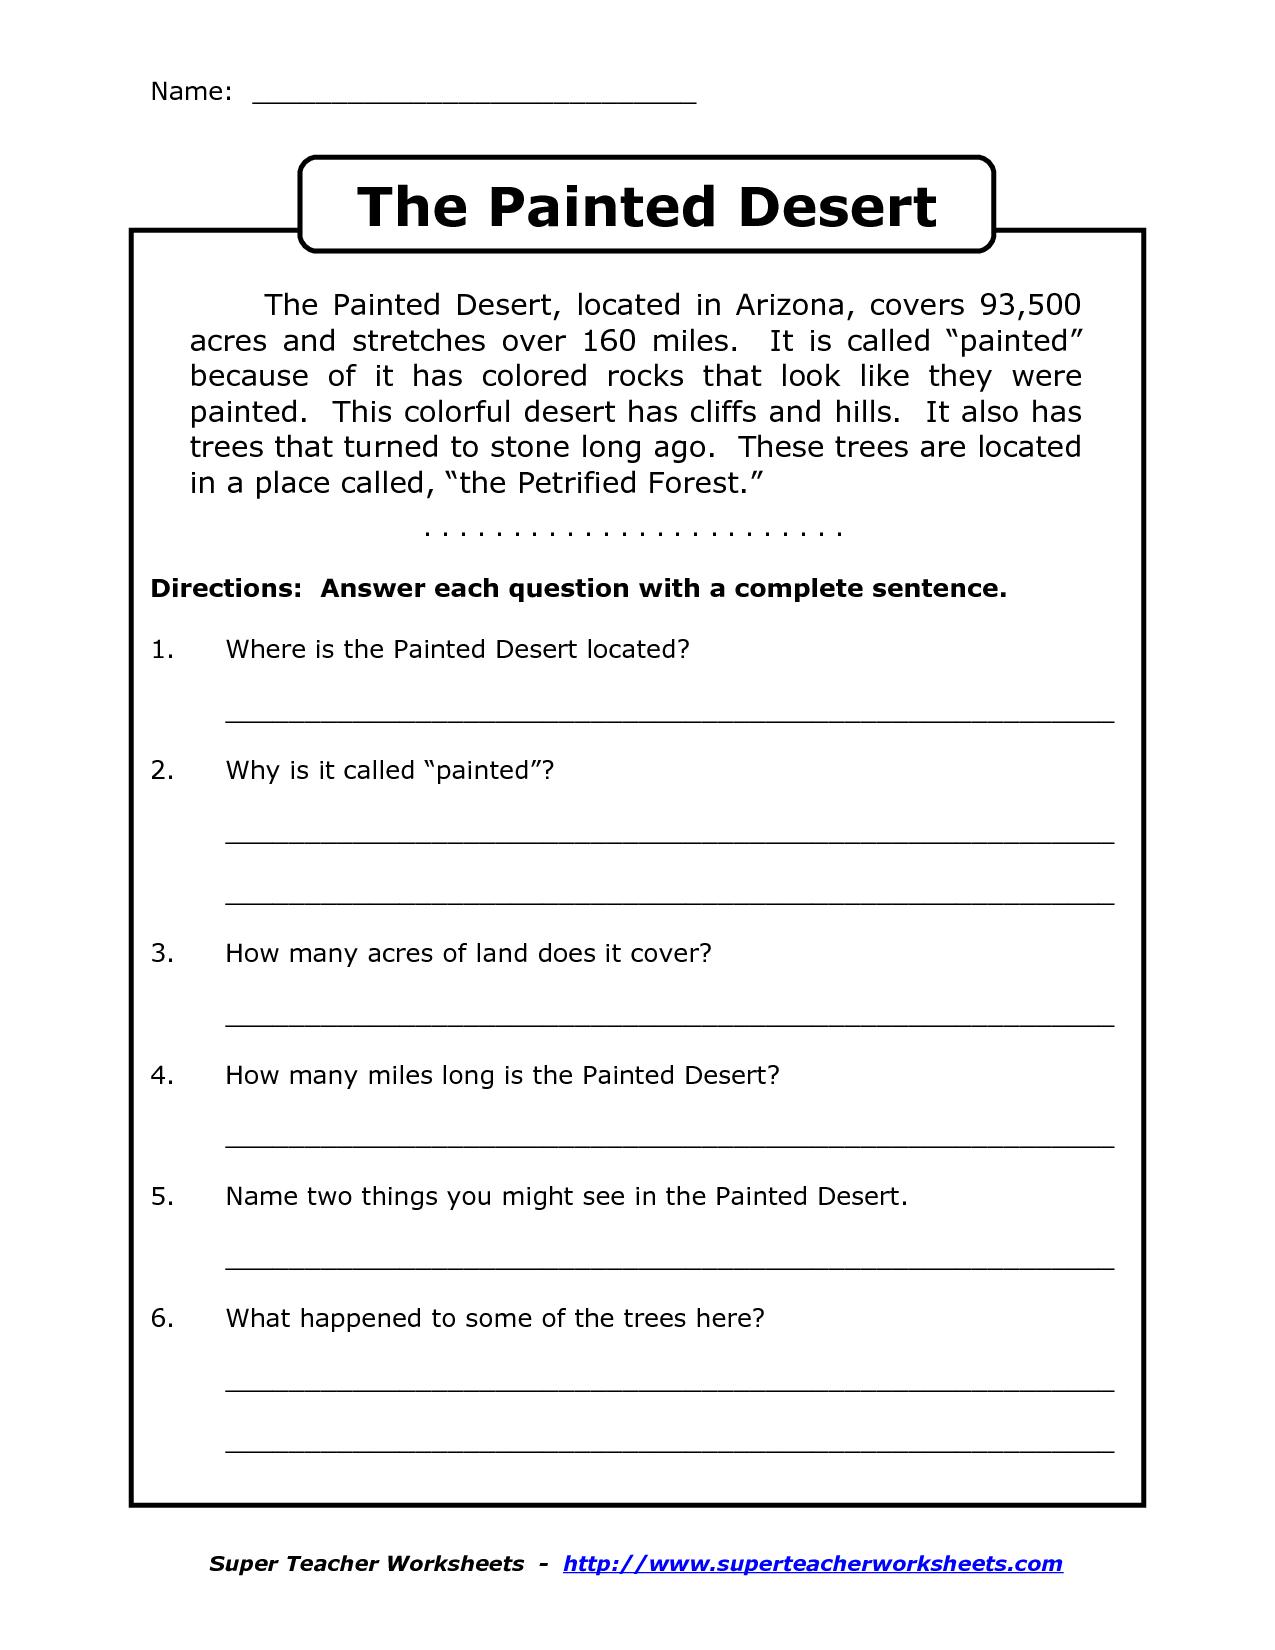 Reading Worksheets For 4Th Grade | Reading Comprehension Worksheets | Free Printable 4Th Grade Reading Worksheets